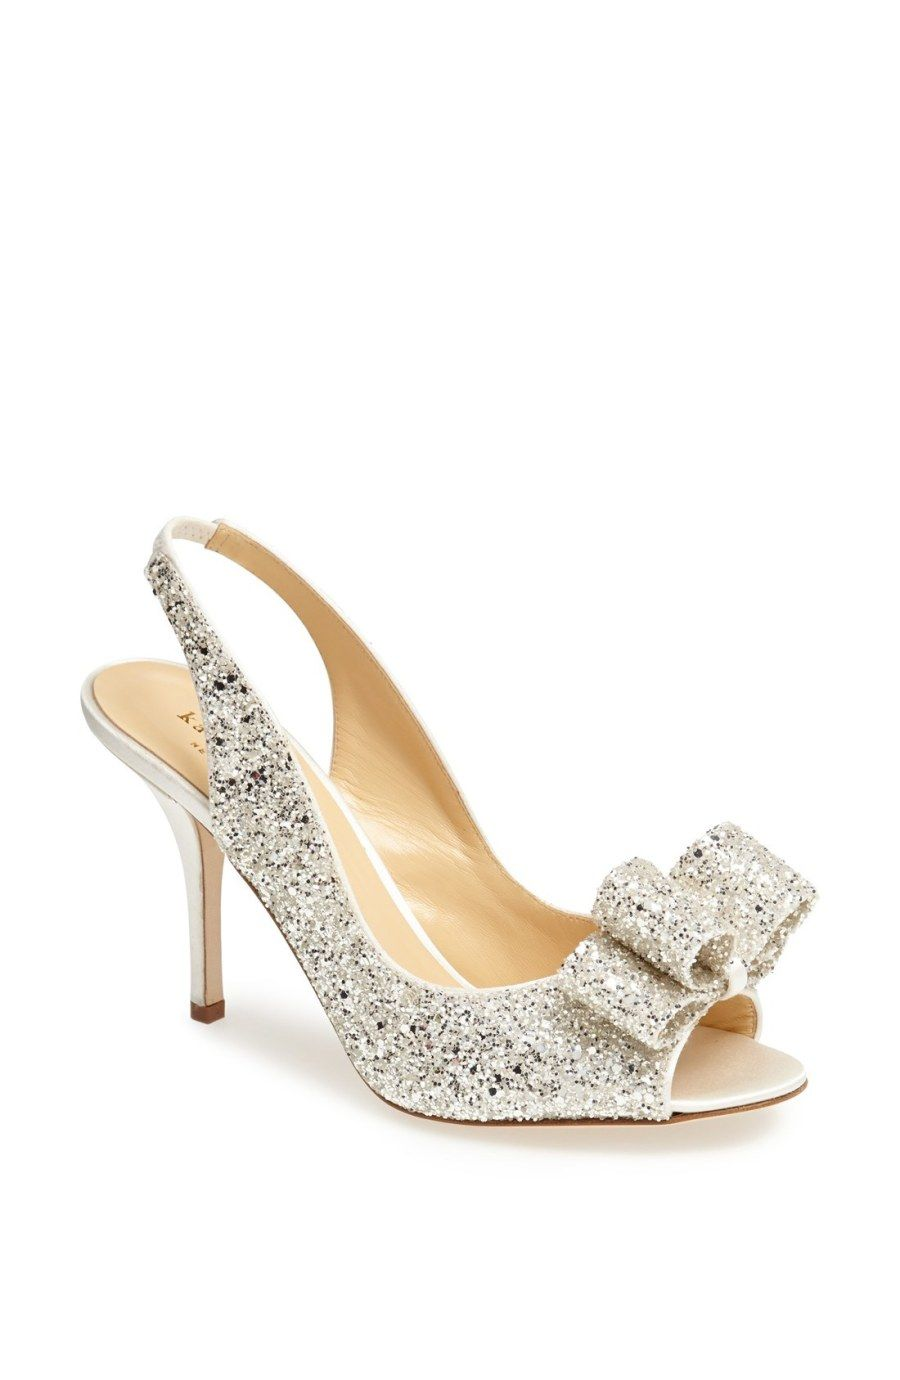 b513b7d02 Fairytale Wedding Shoes That Would Make Even Cinderella Jealous ...